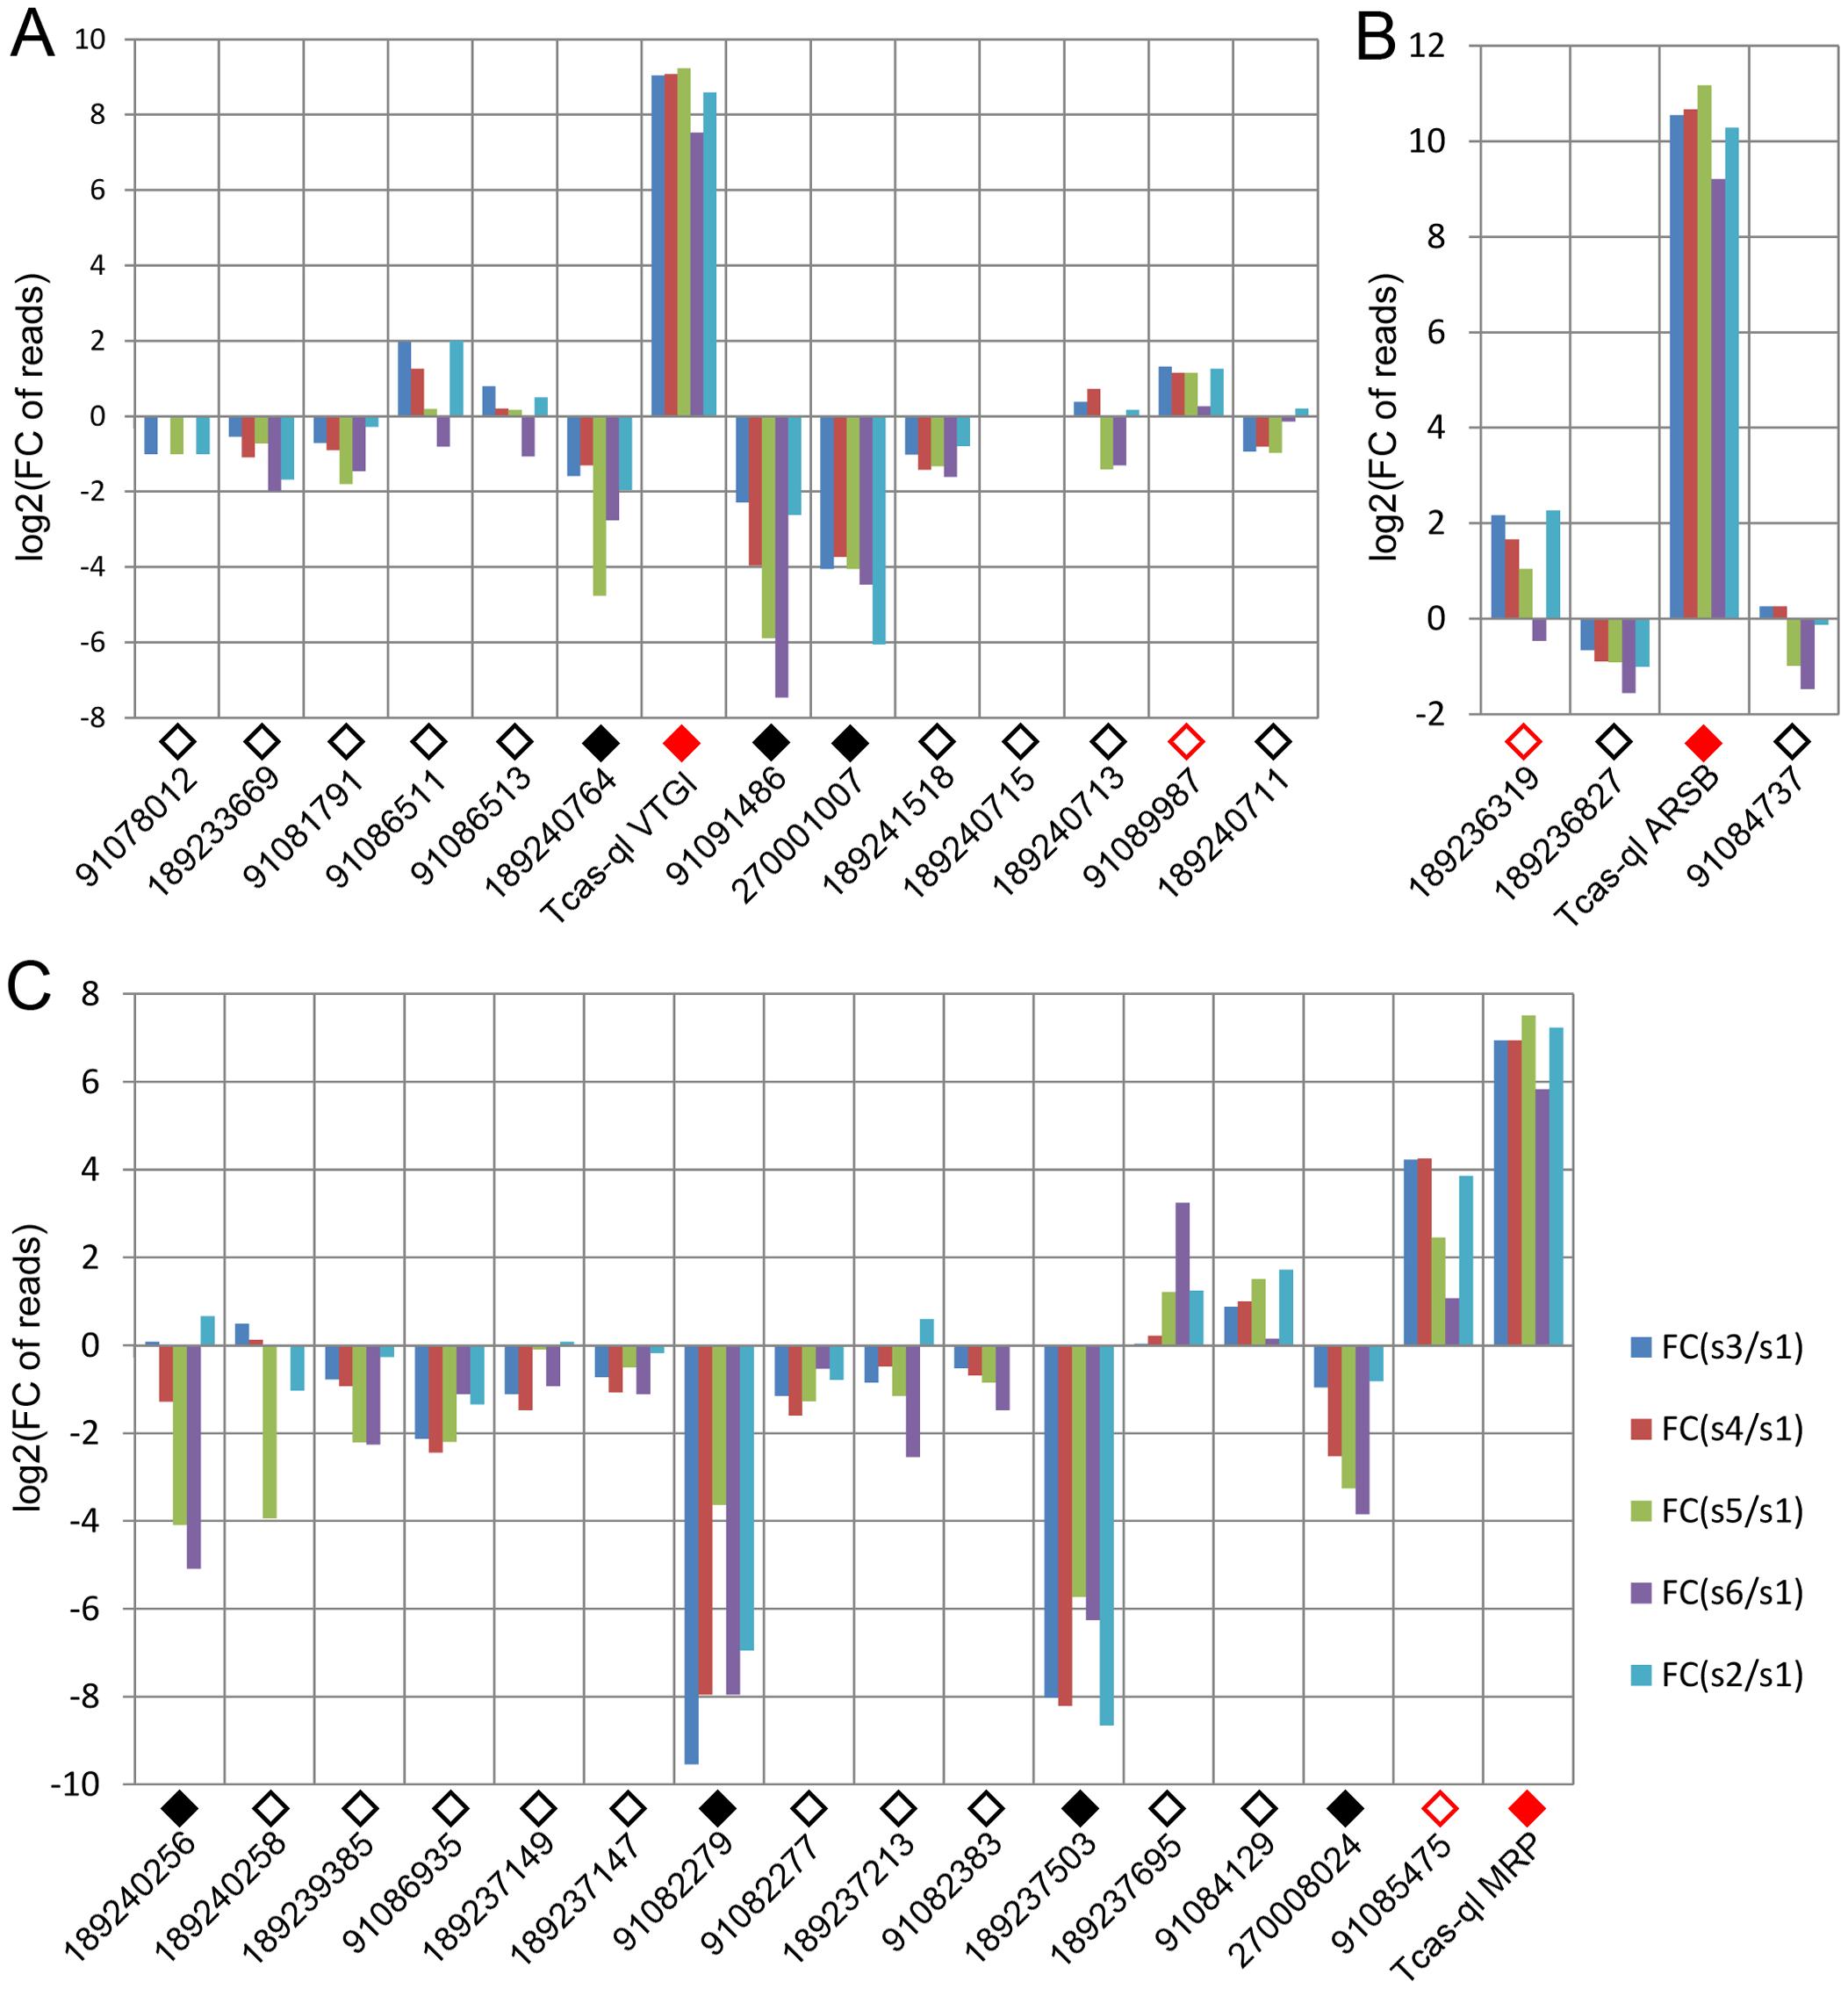 Relative transcriptomic gland expression levels of the <i>Tribolium</i> homologs of the three novel <i>quinone-less</i> genes.